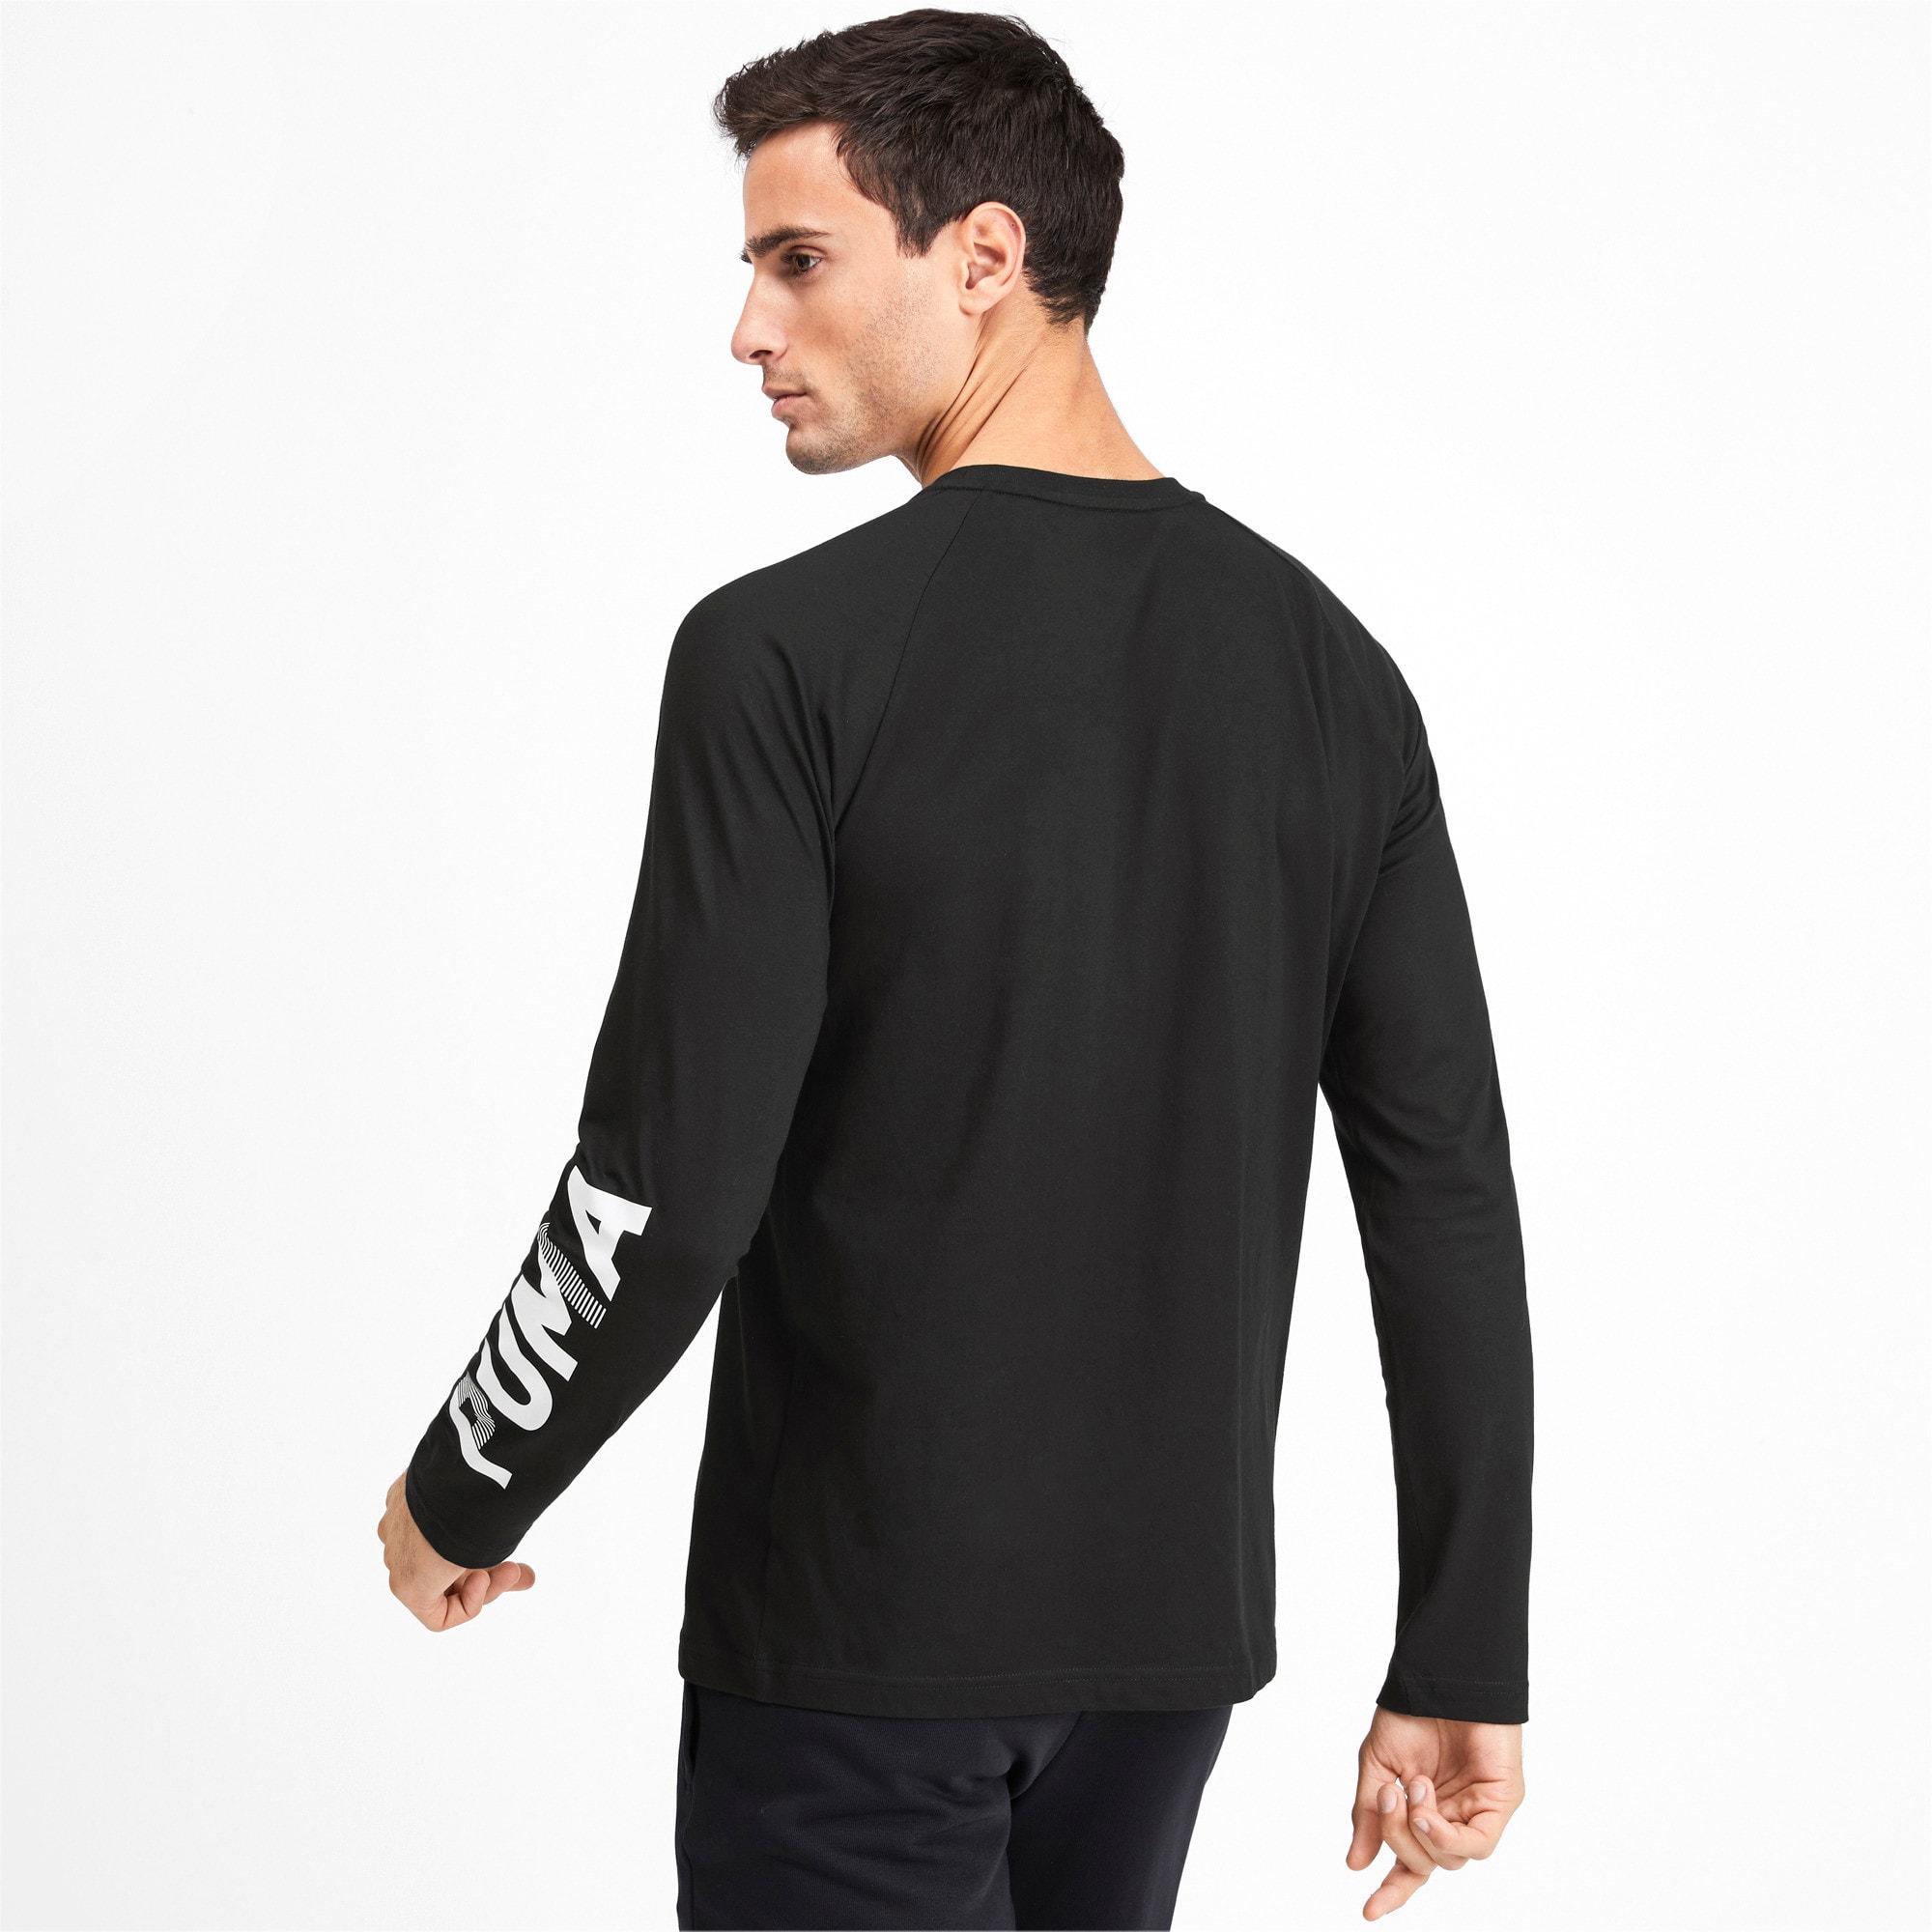 Thumbnail 3 of Modern Sports Men's Long Sleeve Tee, Puma Black, medium